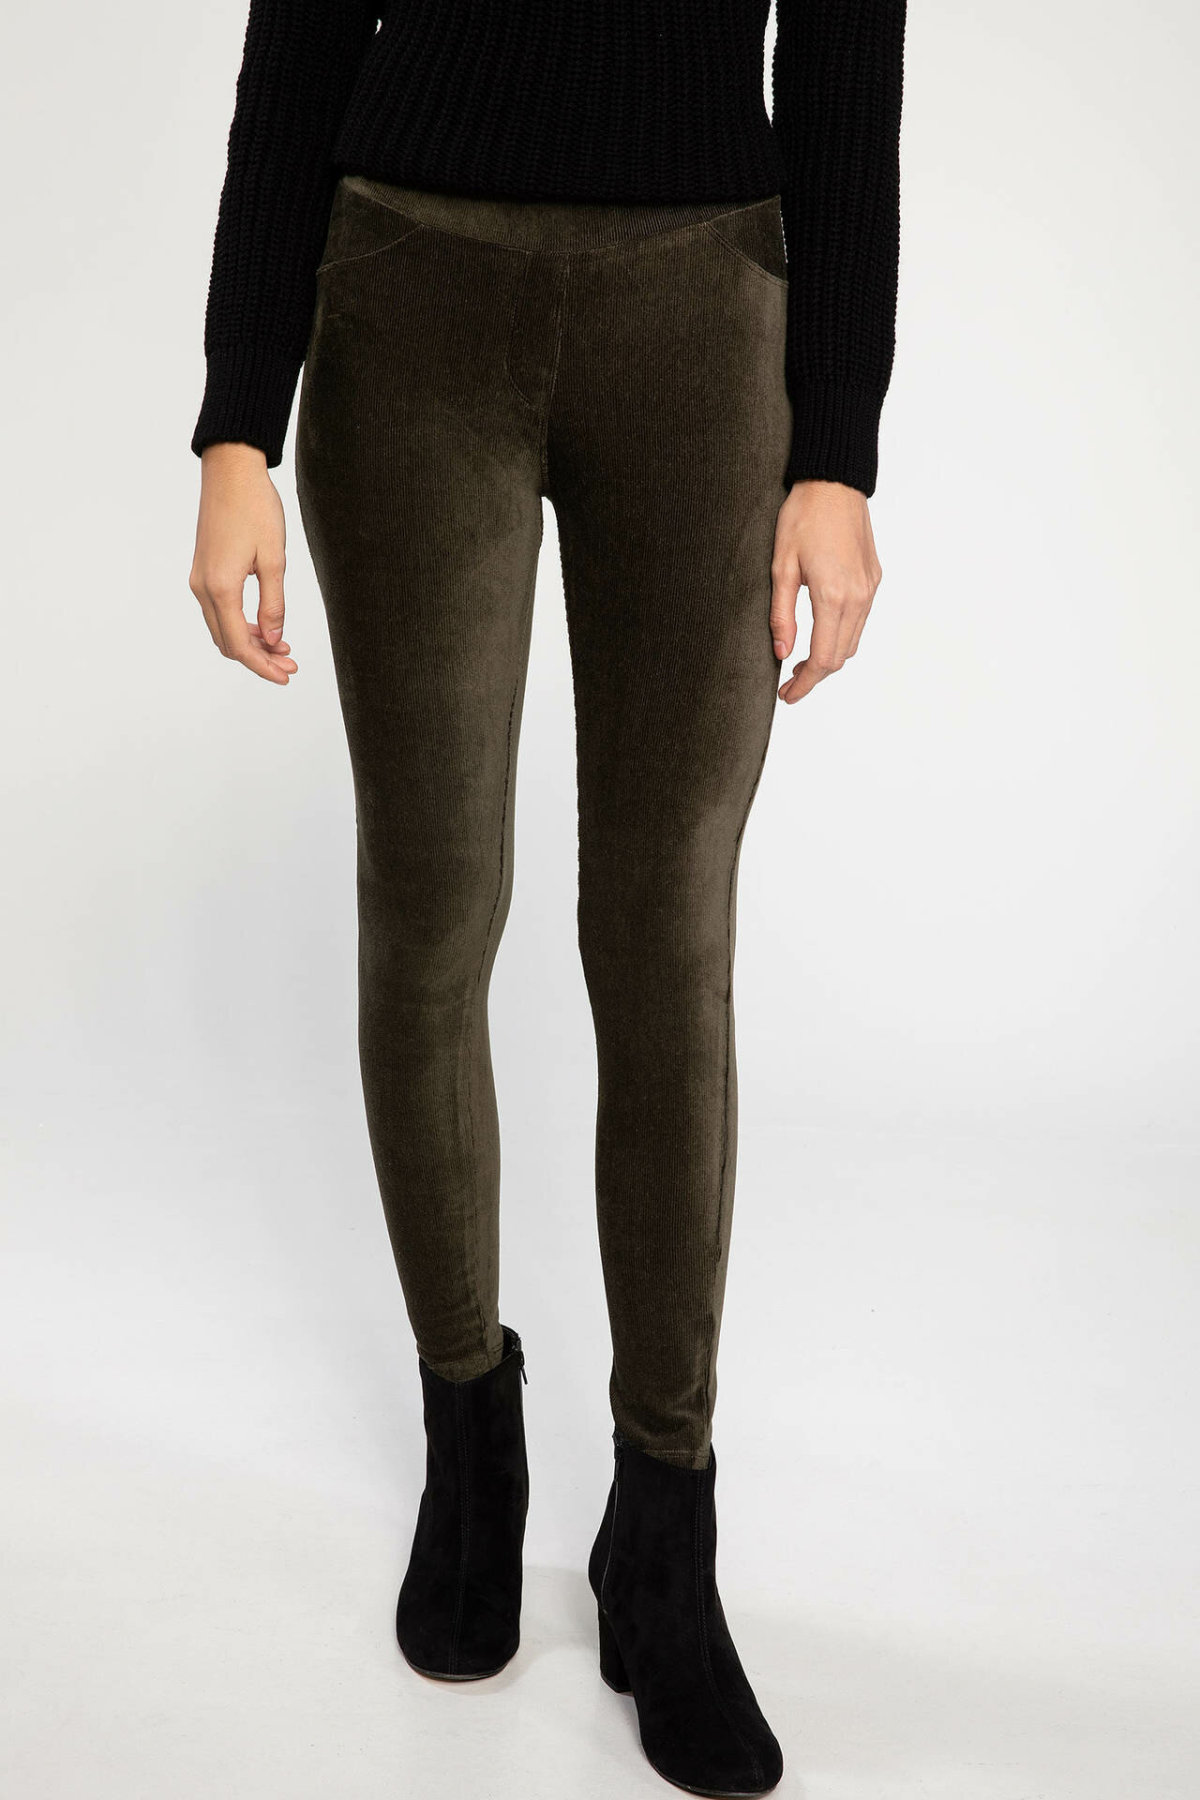 DeFacto New Female Fashion Solid Leisure Leggings Trousers For Women's Casual Slim Pants Comfort Crop Pants Ladies -K0563AZ18WN